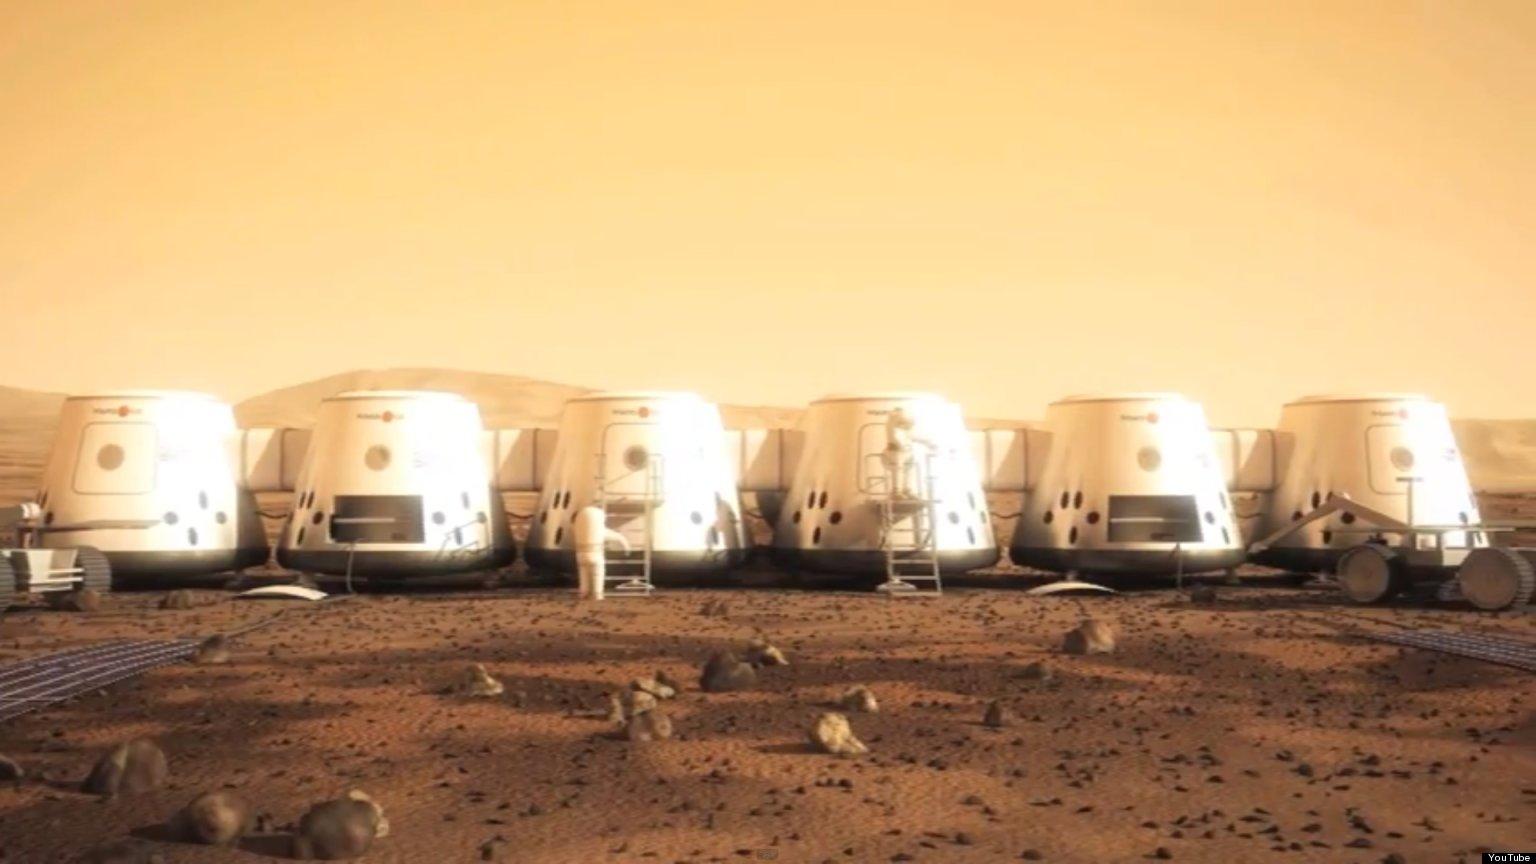 mars one astronaut applicants - photo #4